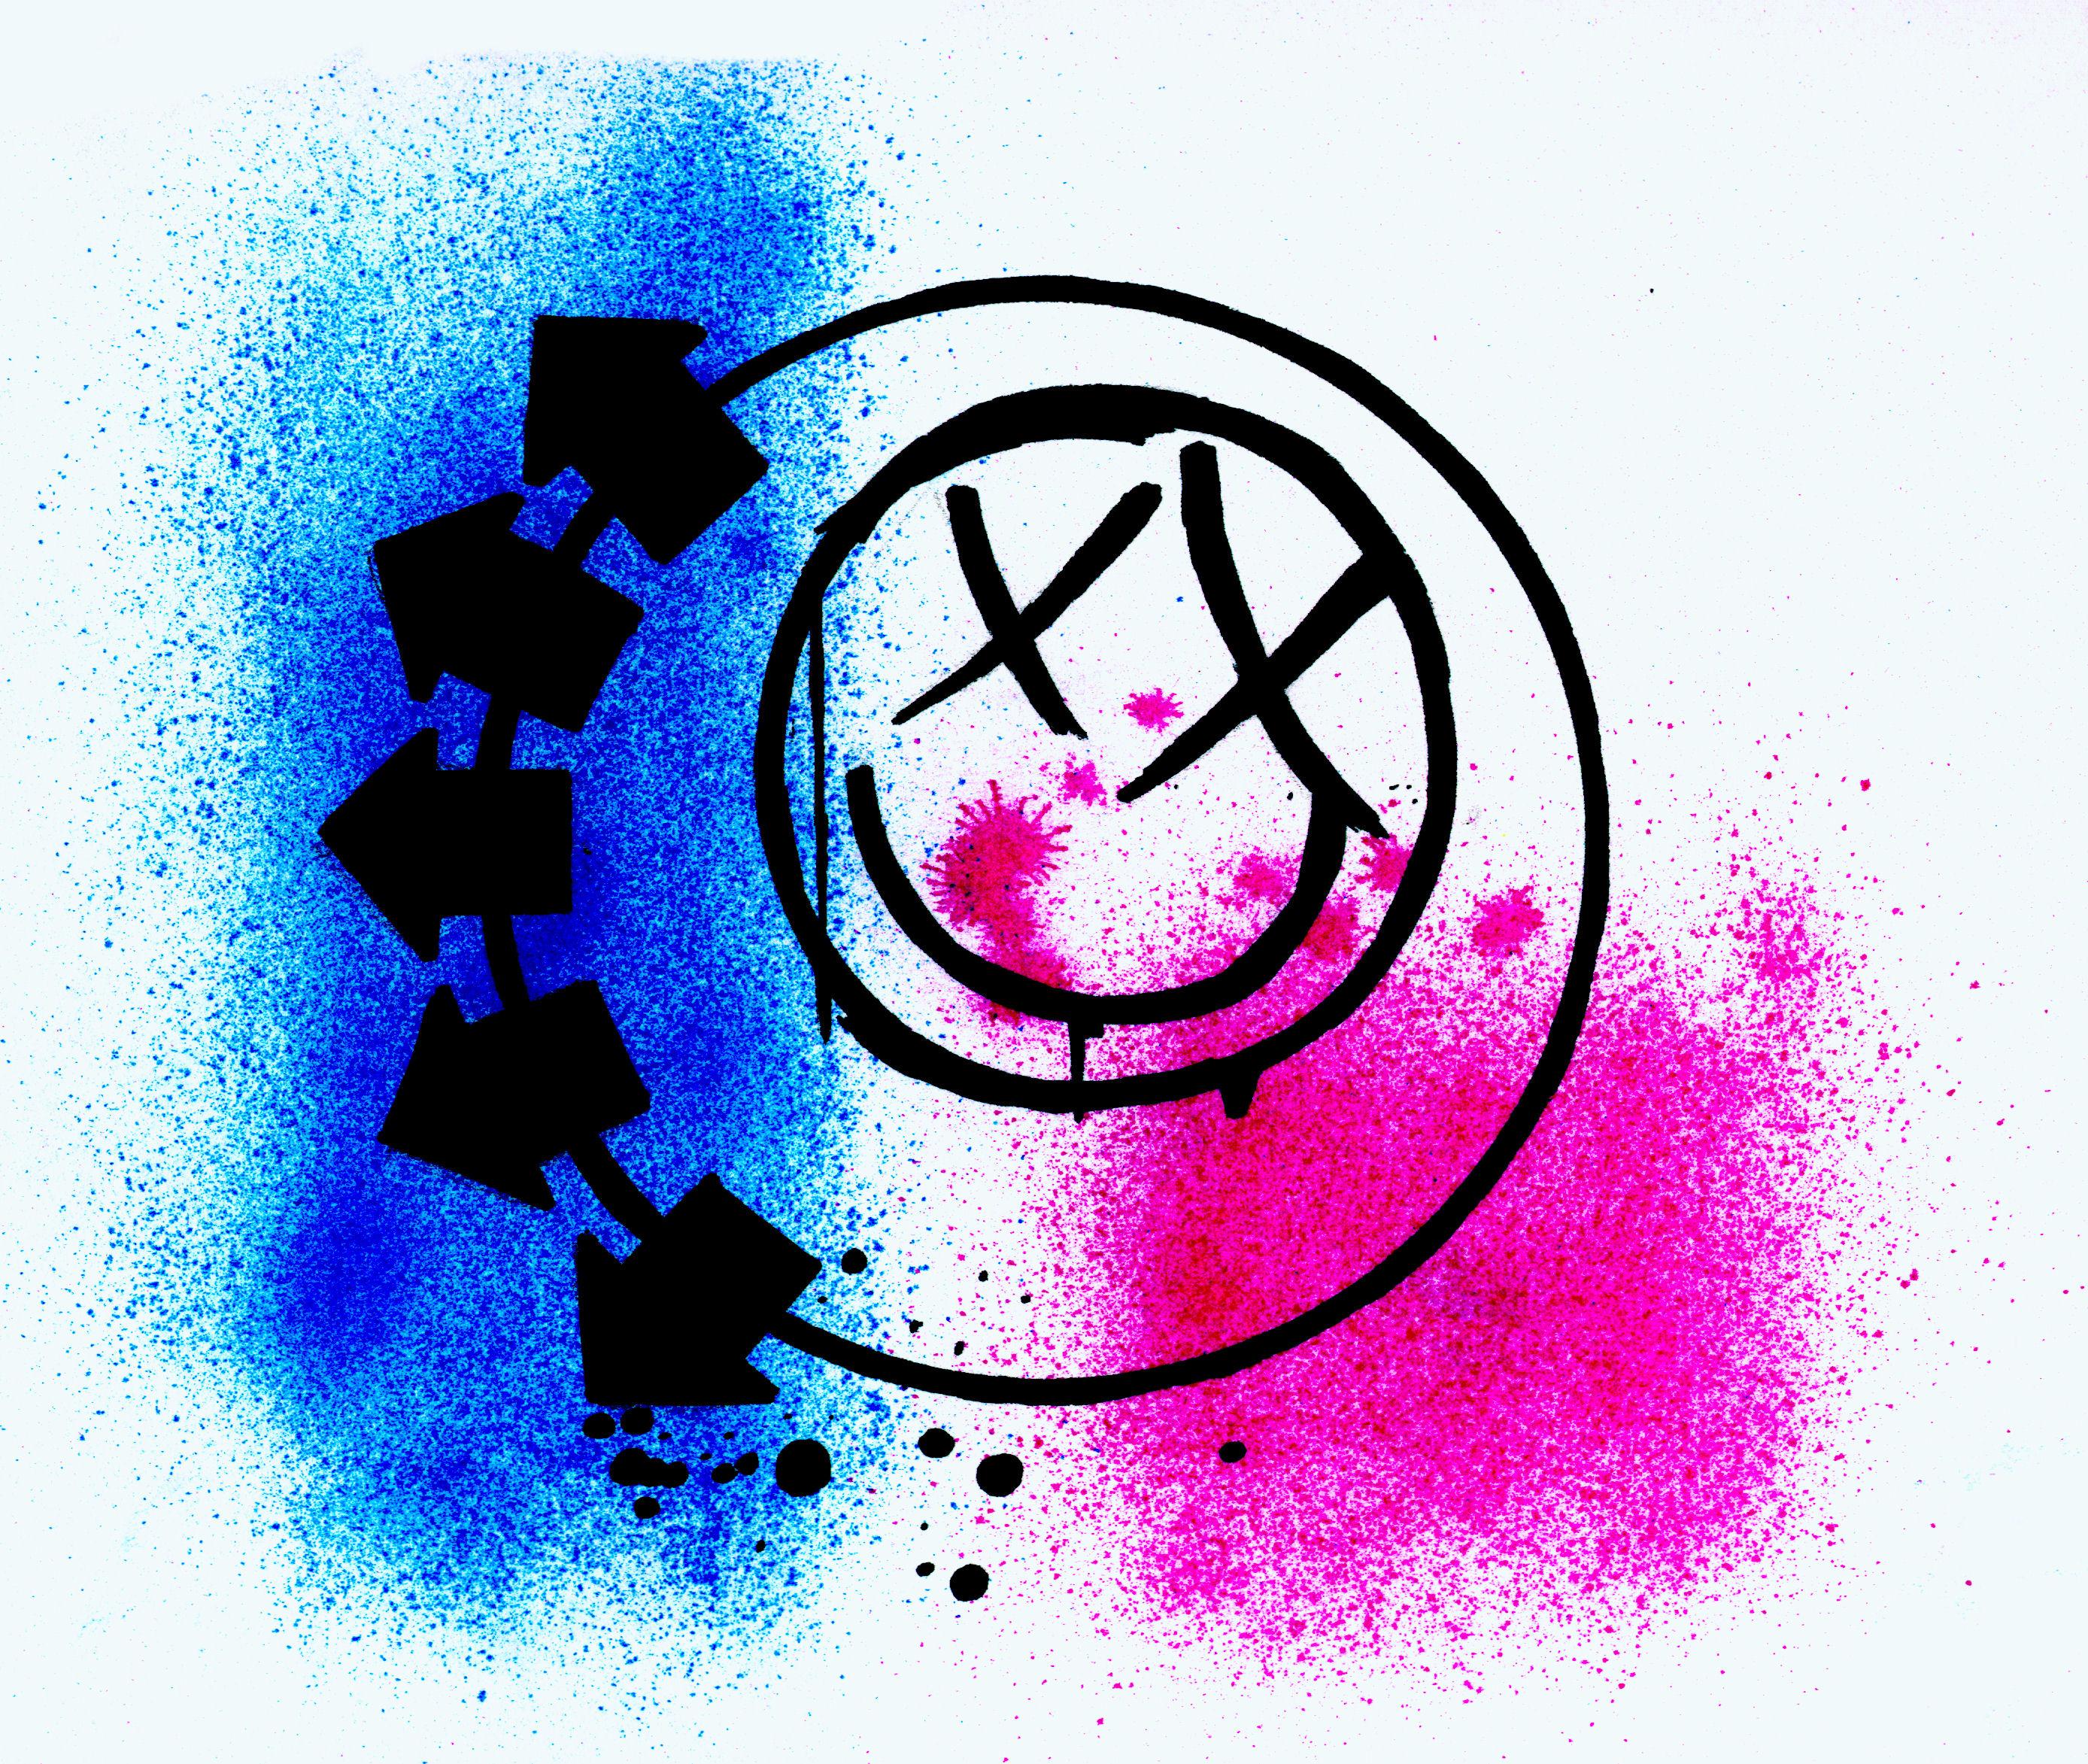 Fall Colors Desktop Wallpaper Hd Blink 182 Backgrounds Pixelstalk Net